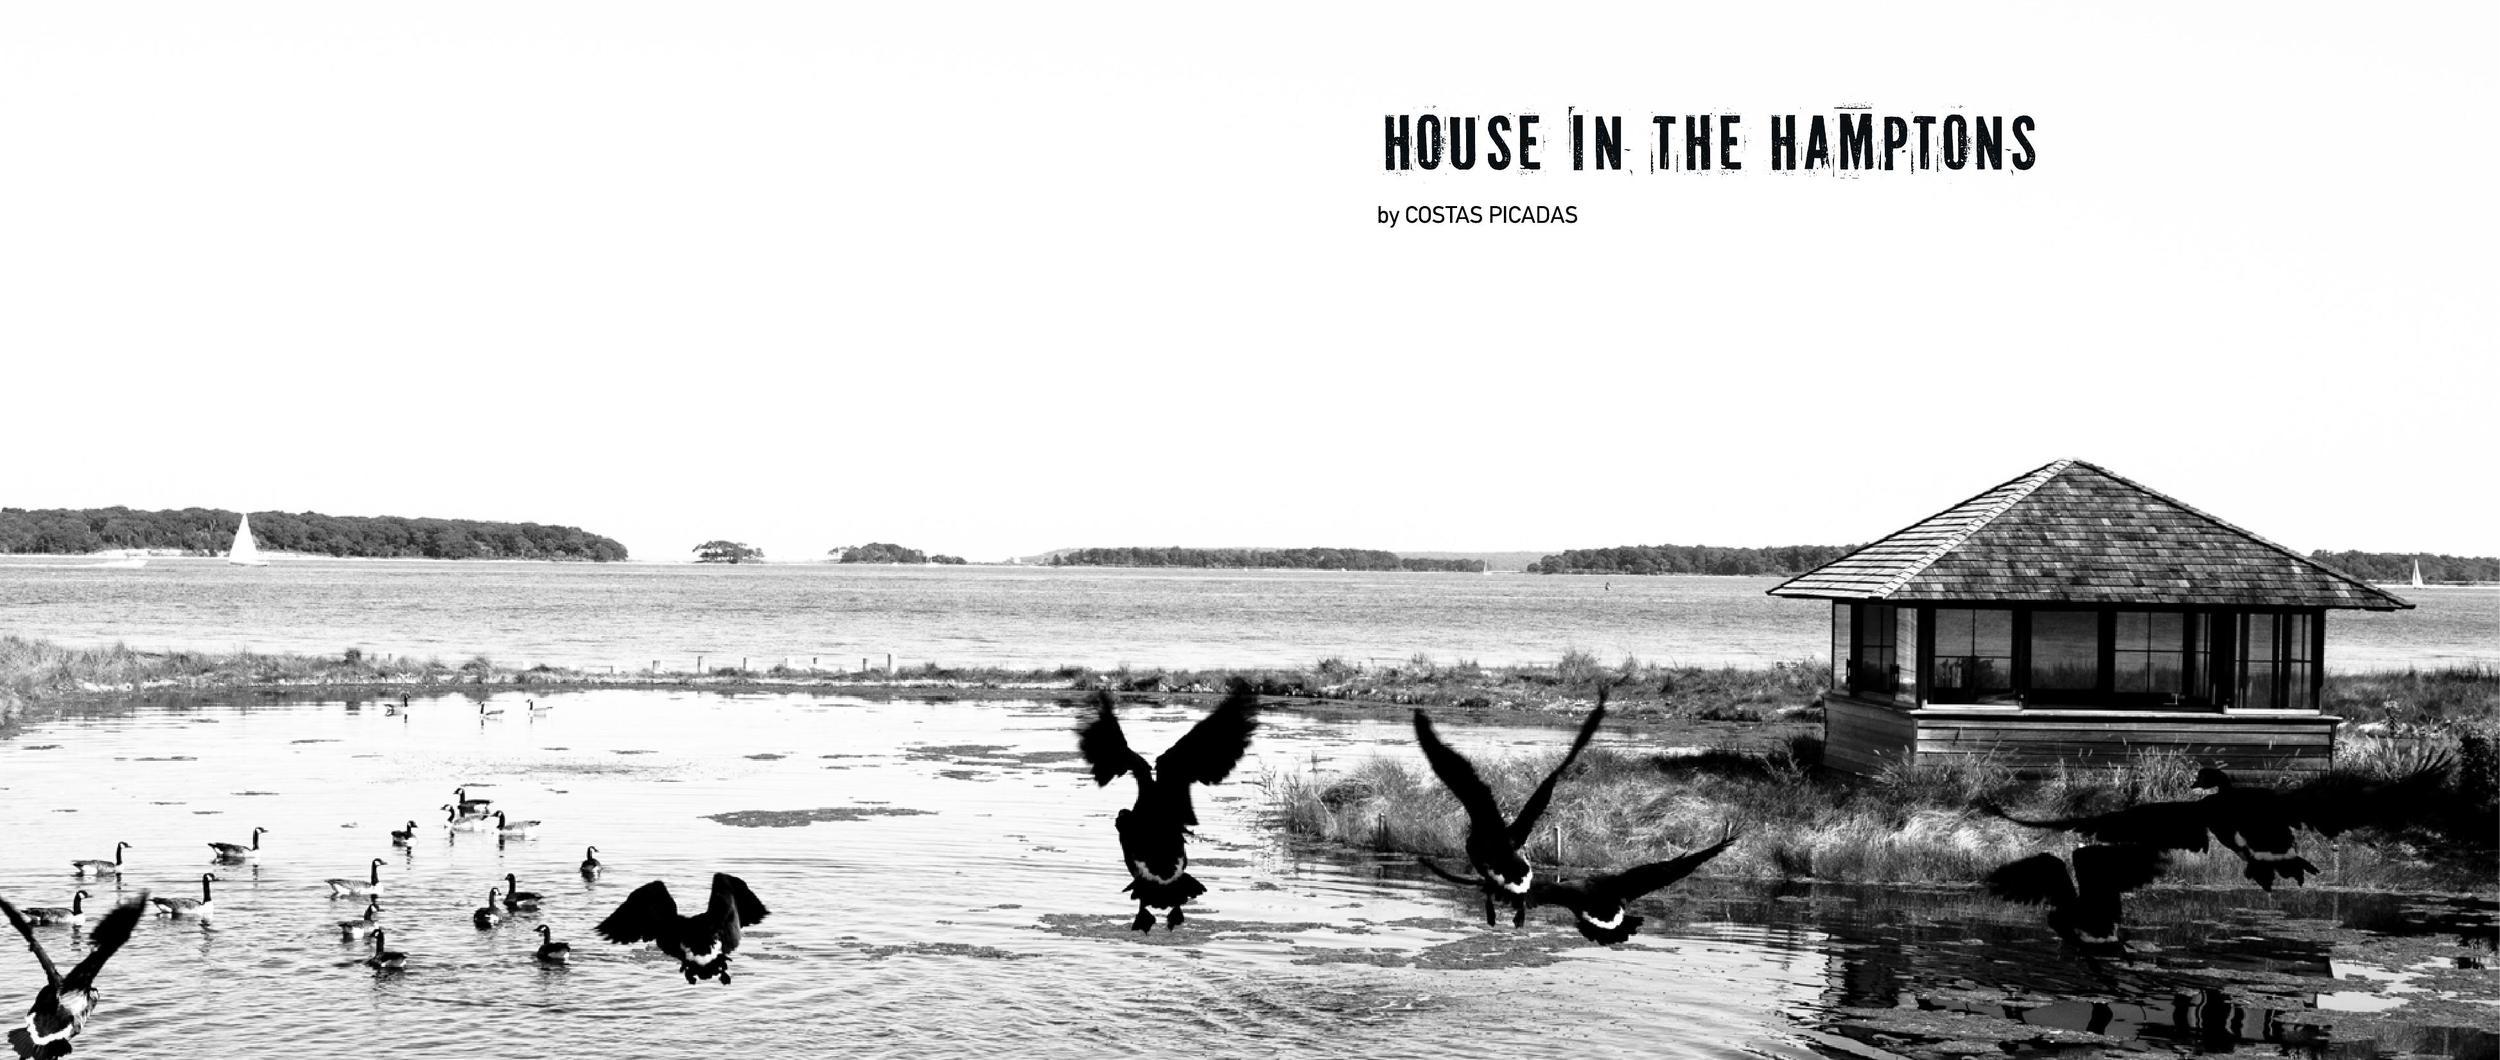 1-HOUSE IN THE HAMPTONS_000001.jpg